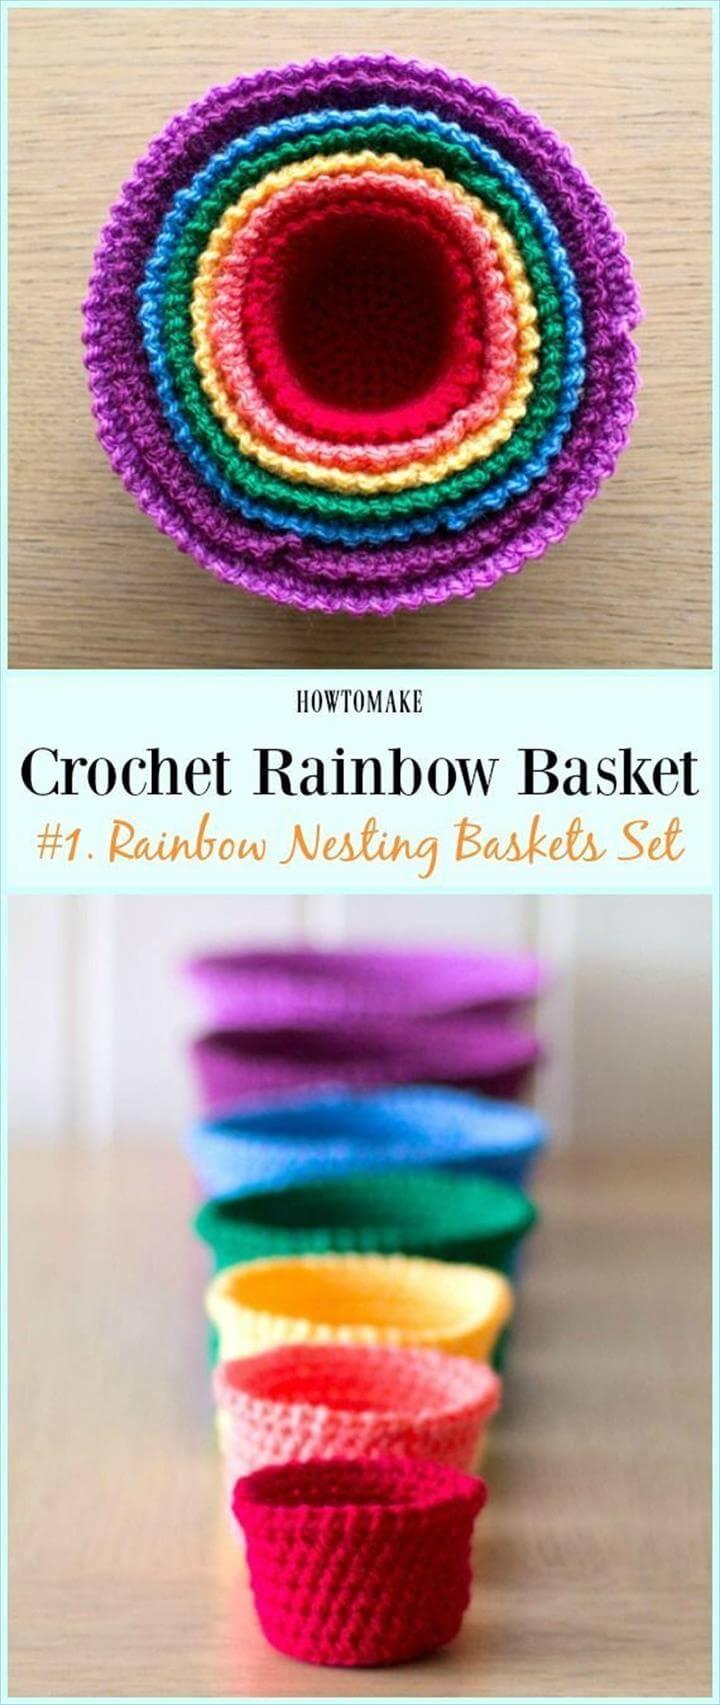 Rainbow Nesting Baskets Set Free Crochet Pattern